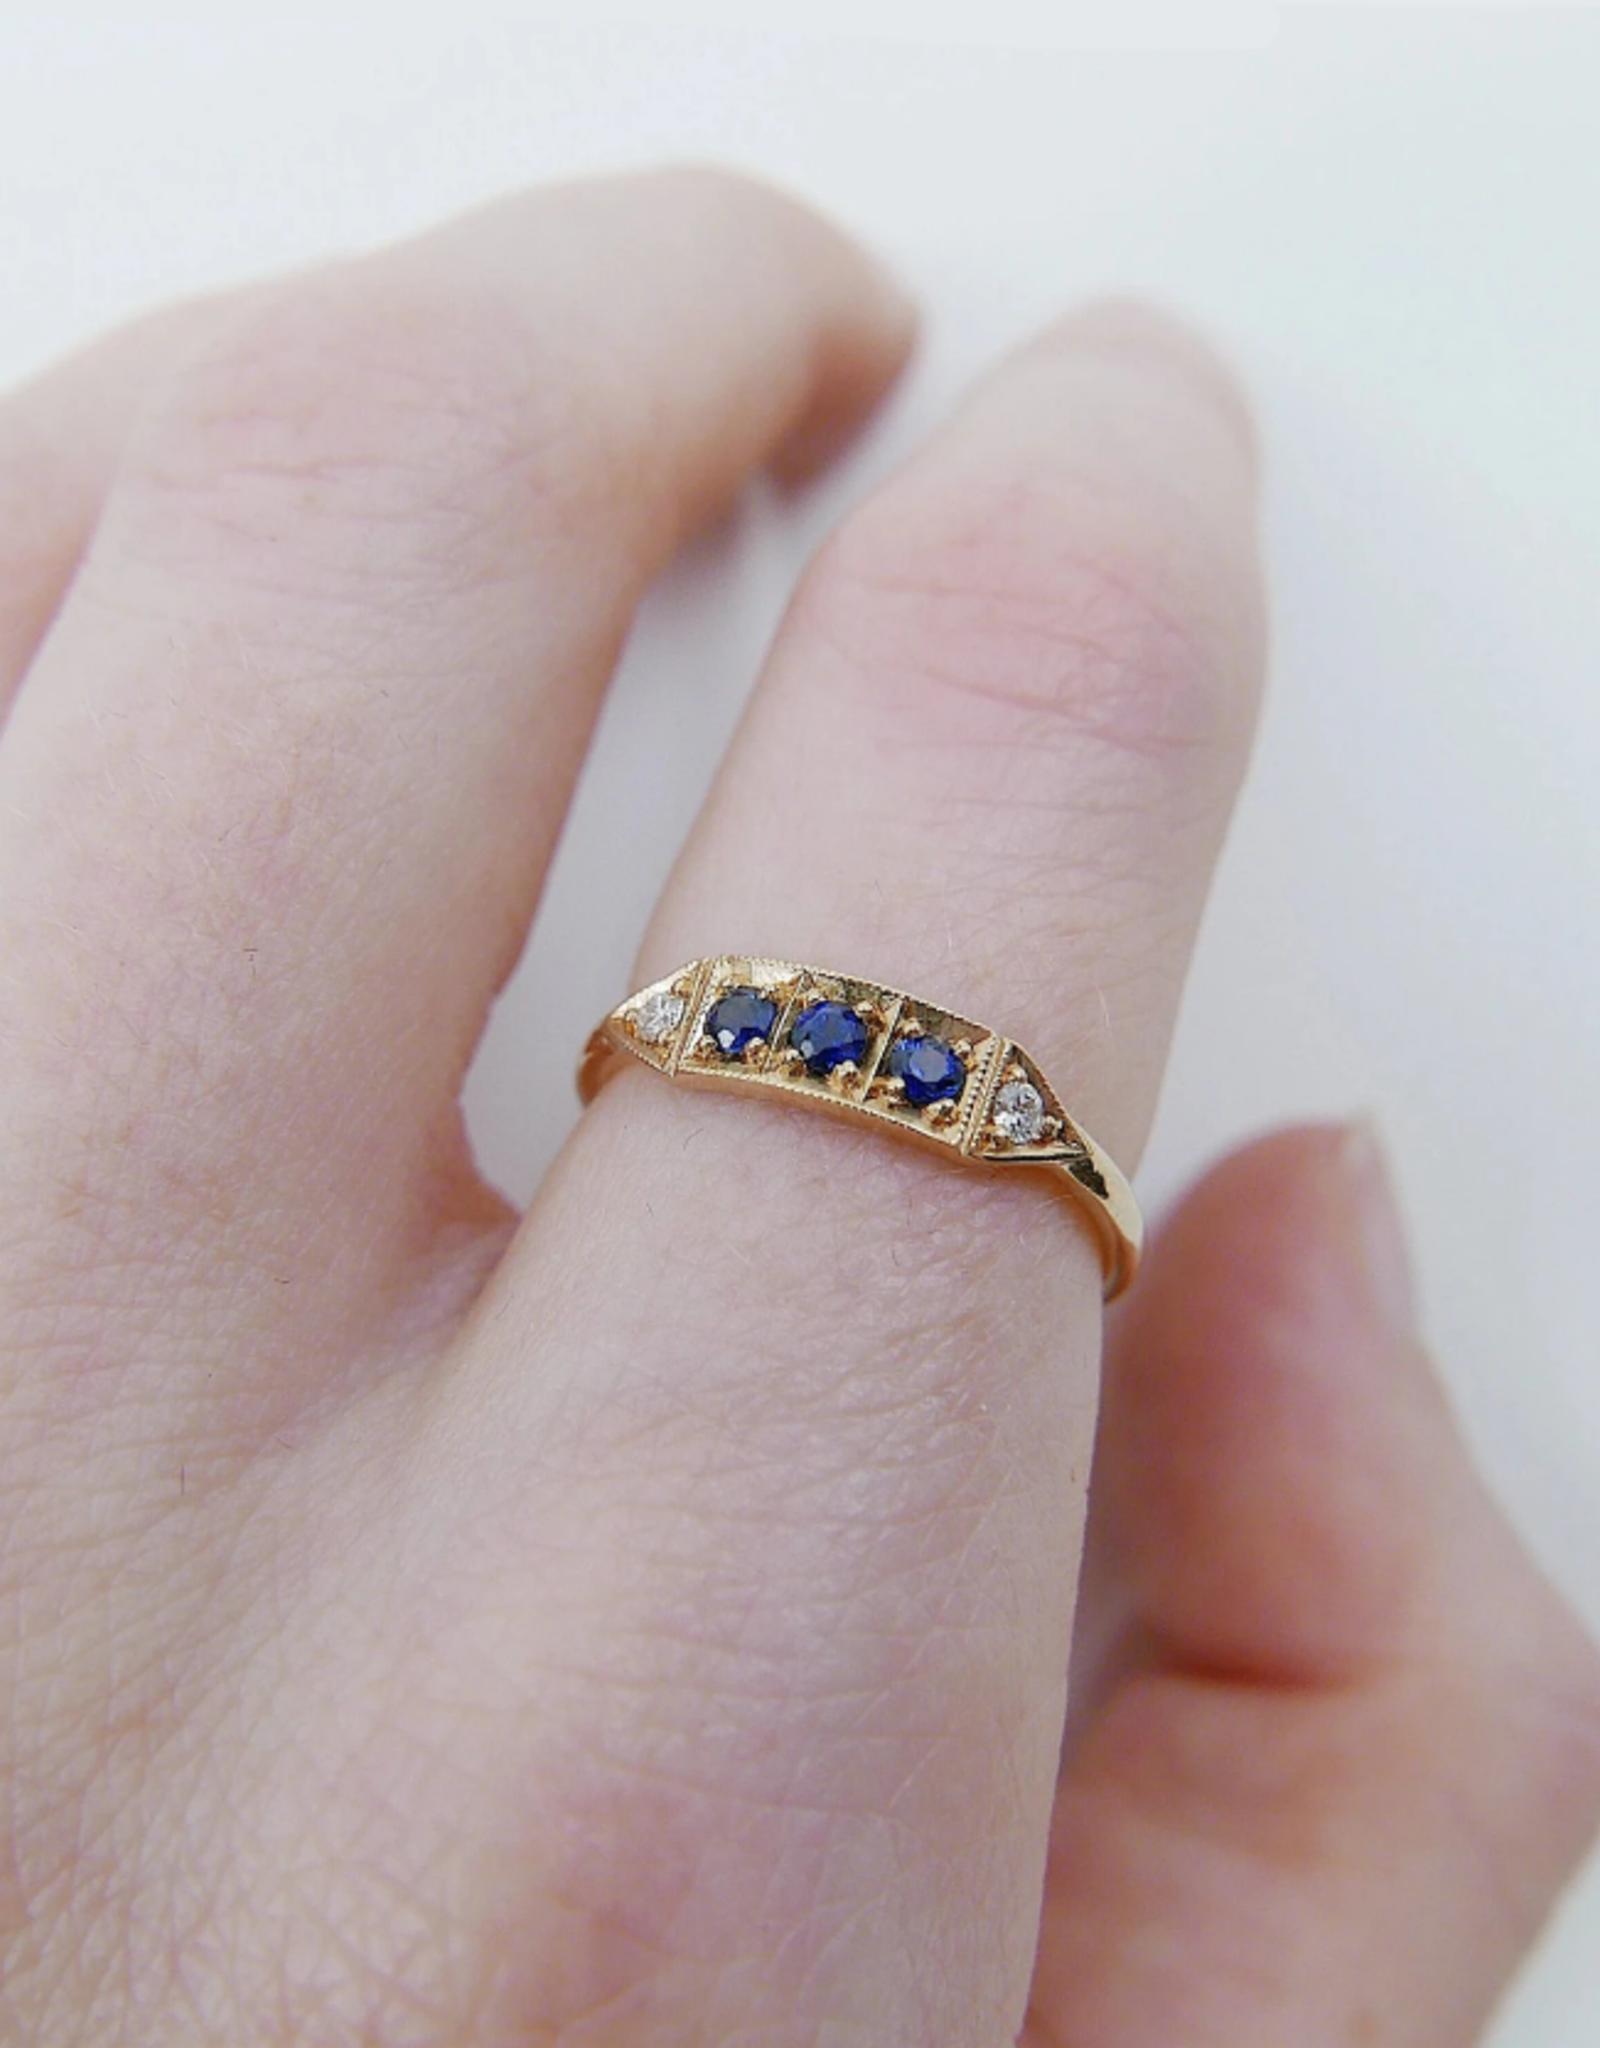 Mason Grace Jewelry Ms. Goodbar Blue Sapphire Ring